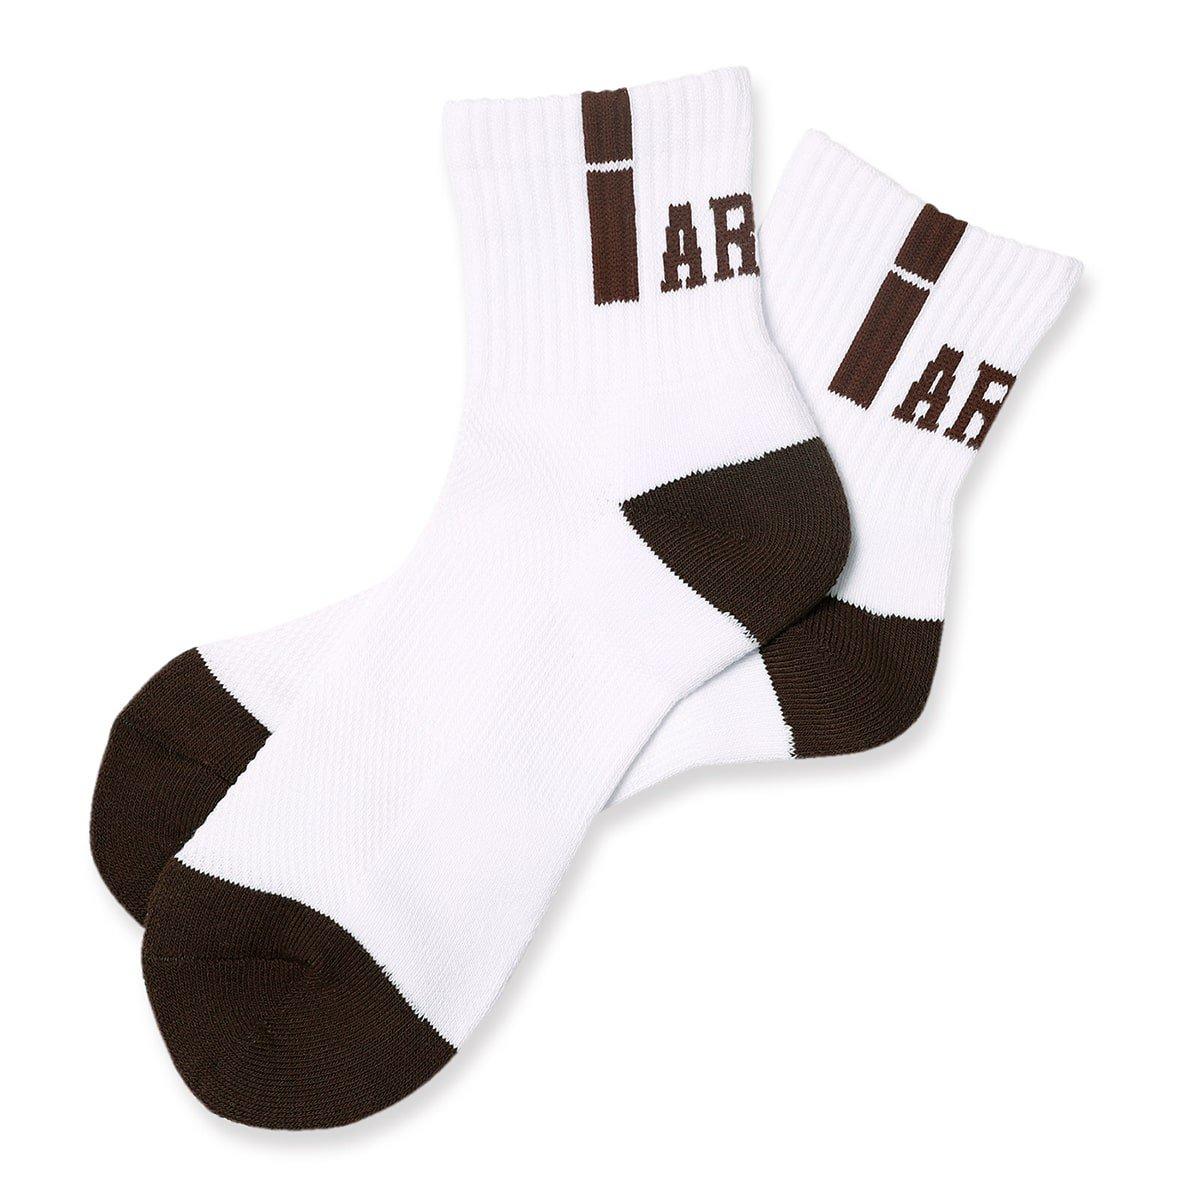 vertical crew socks【white/brown】